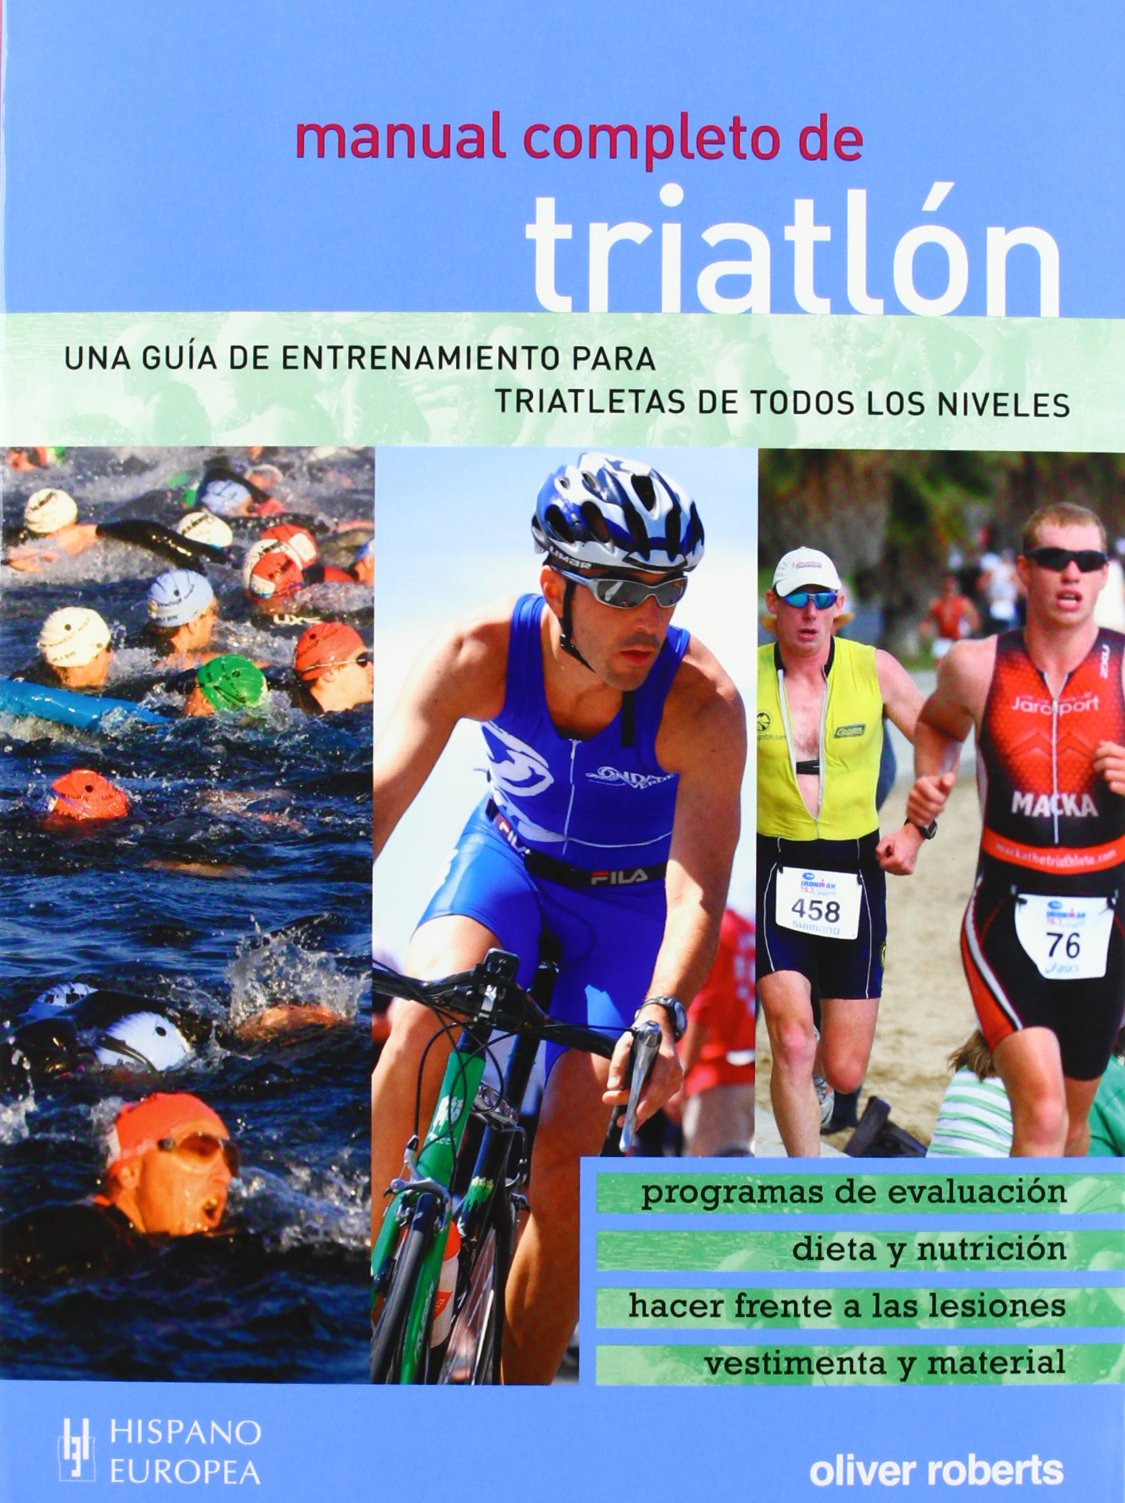 Manual completo de triatlon / Triathlon Complete Manual (Spanish Edition) (Spanish) Paperback – November 30, 2012